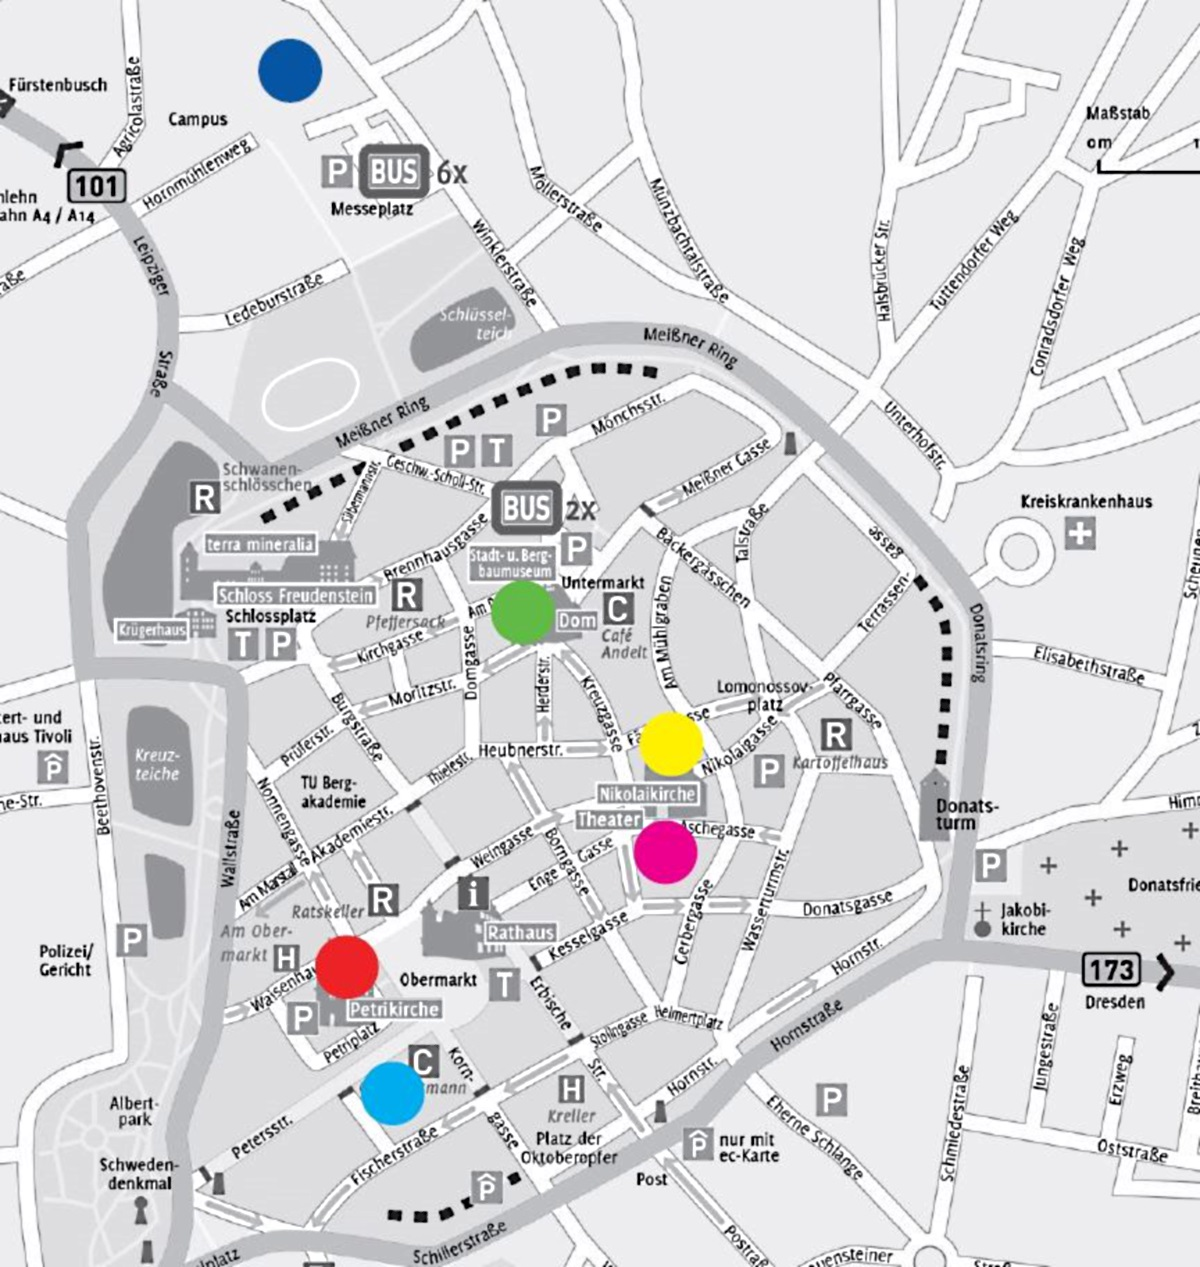 Karte aller Veranstaltungsorte